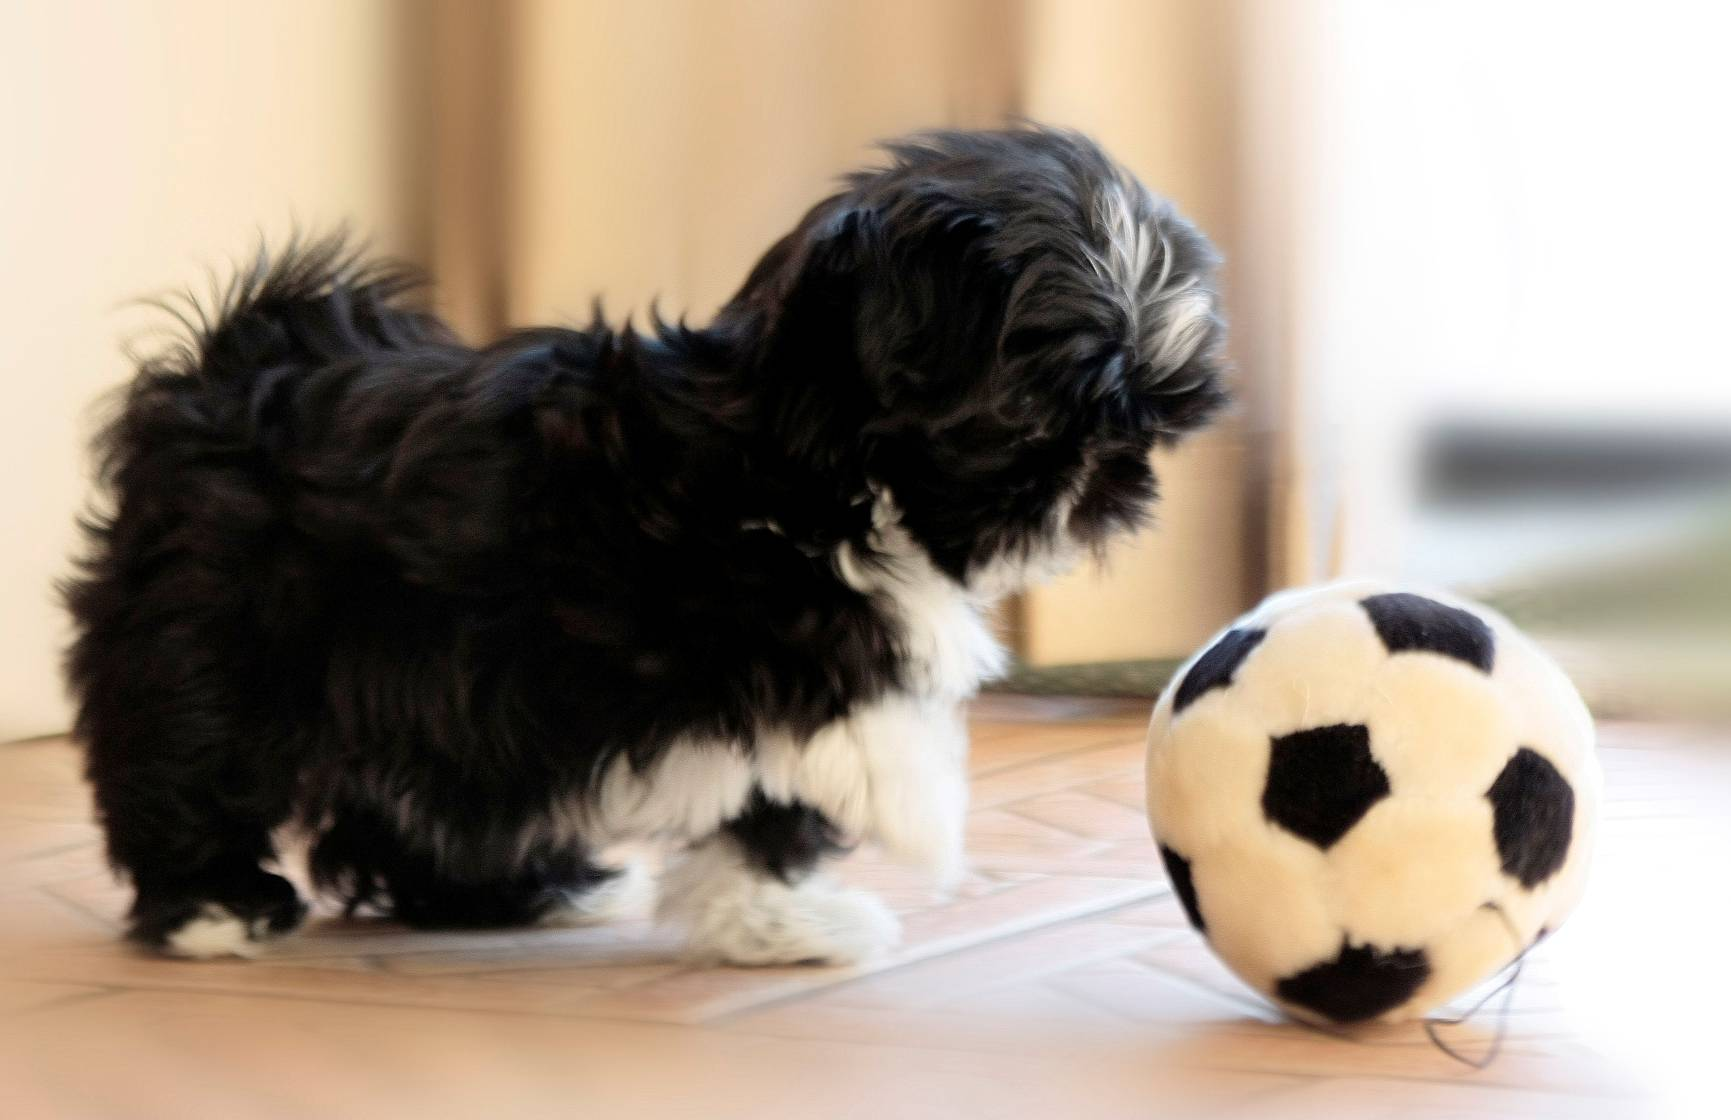 Dog Food For Puppy Shih Tzu